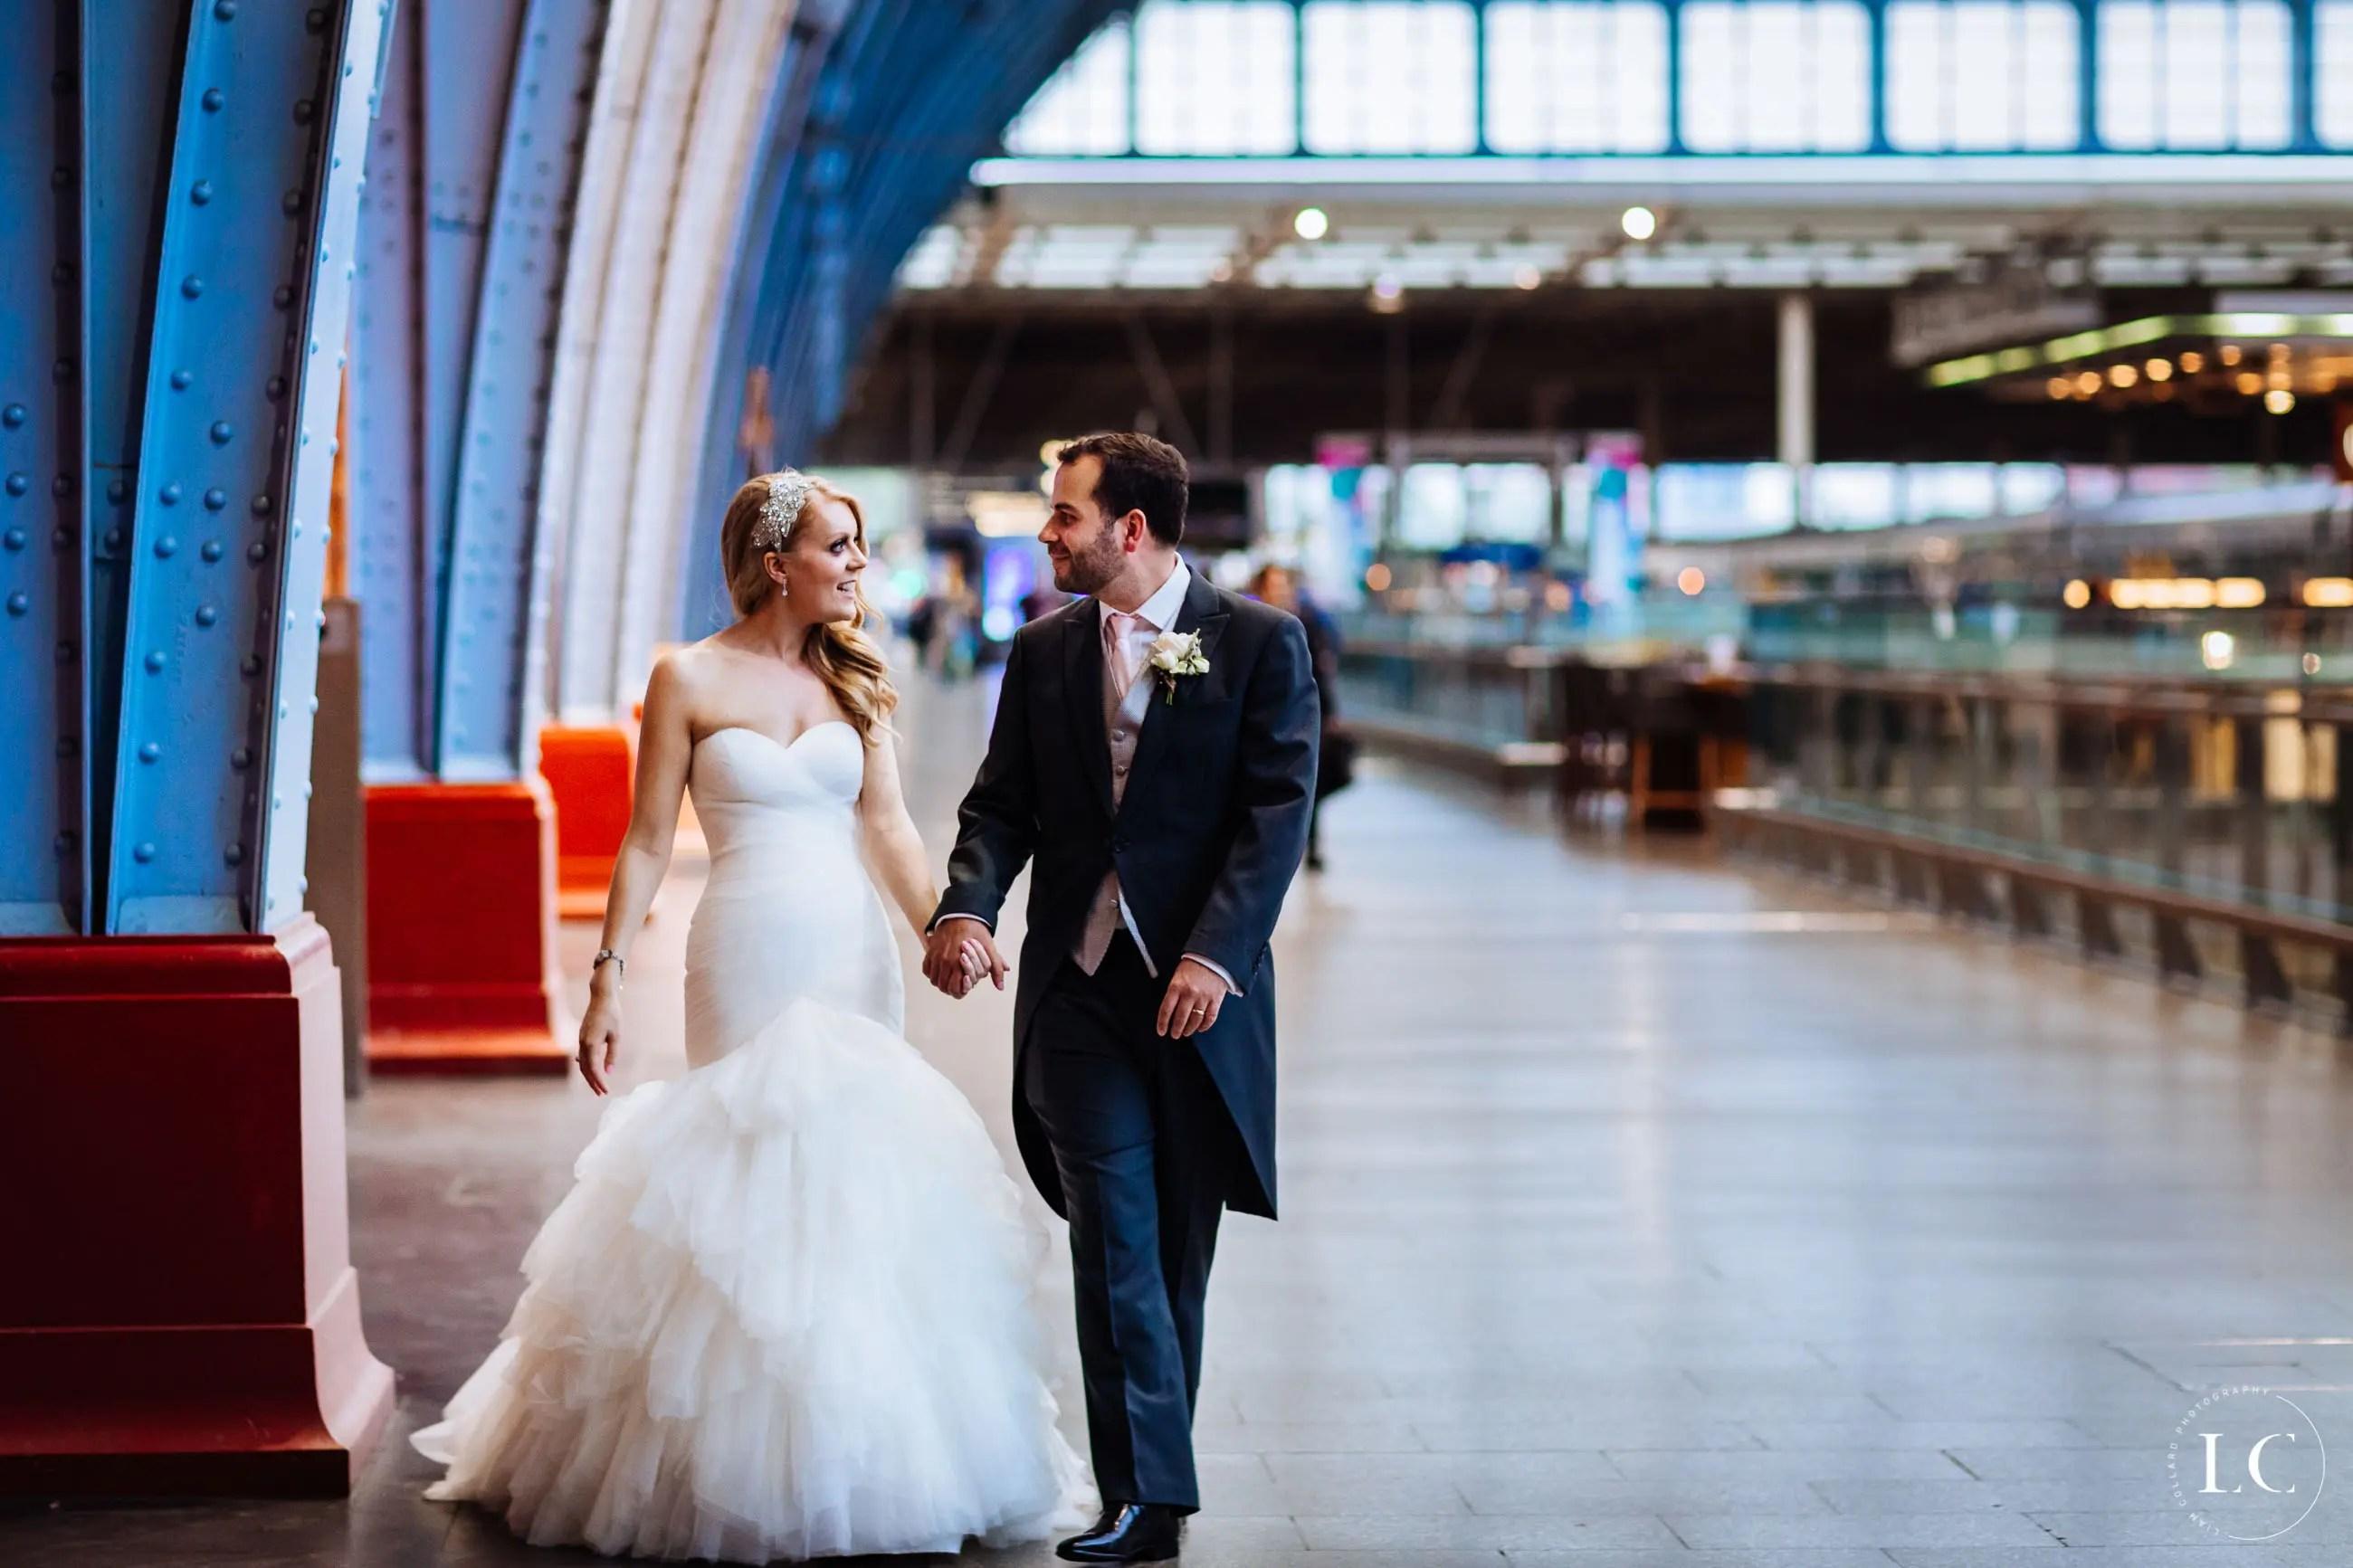 Couple walking in St Pancras Station